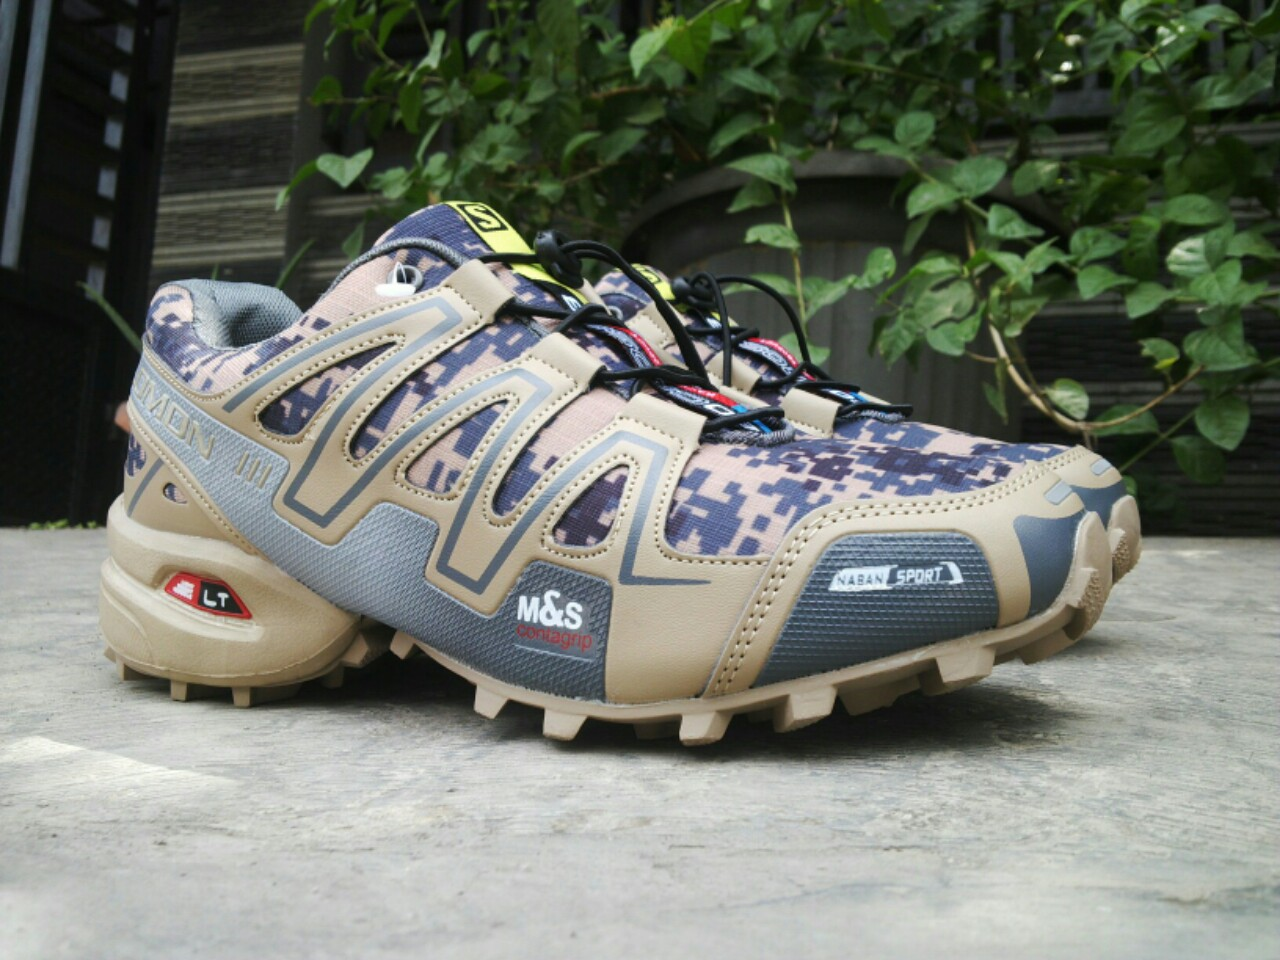 uk availability 1abb7 0369f purchase jual sepatu nike janoski original jual sepatu nike original kaskus  jual sepatu nike original kaskus